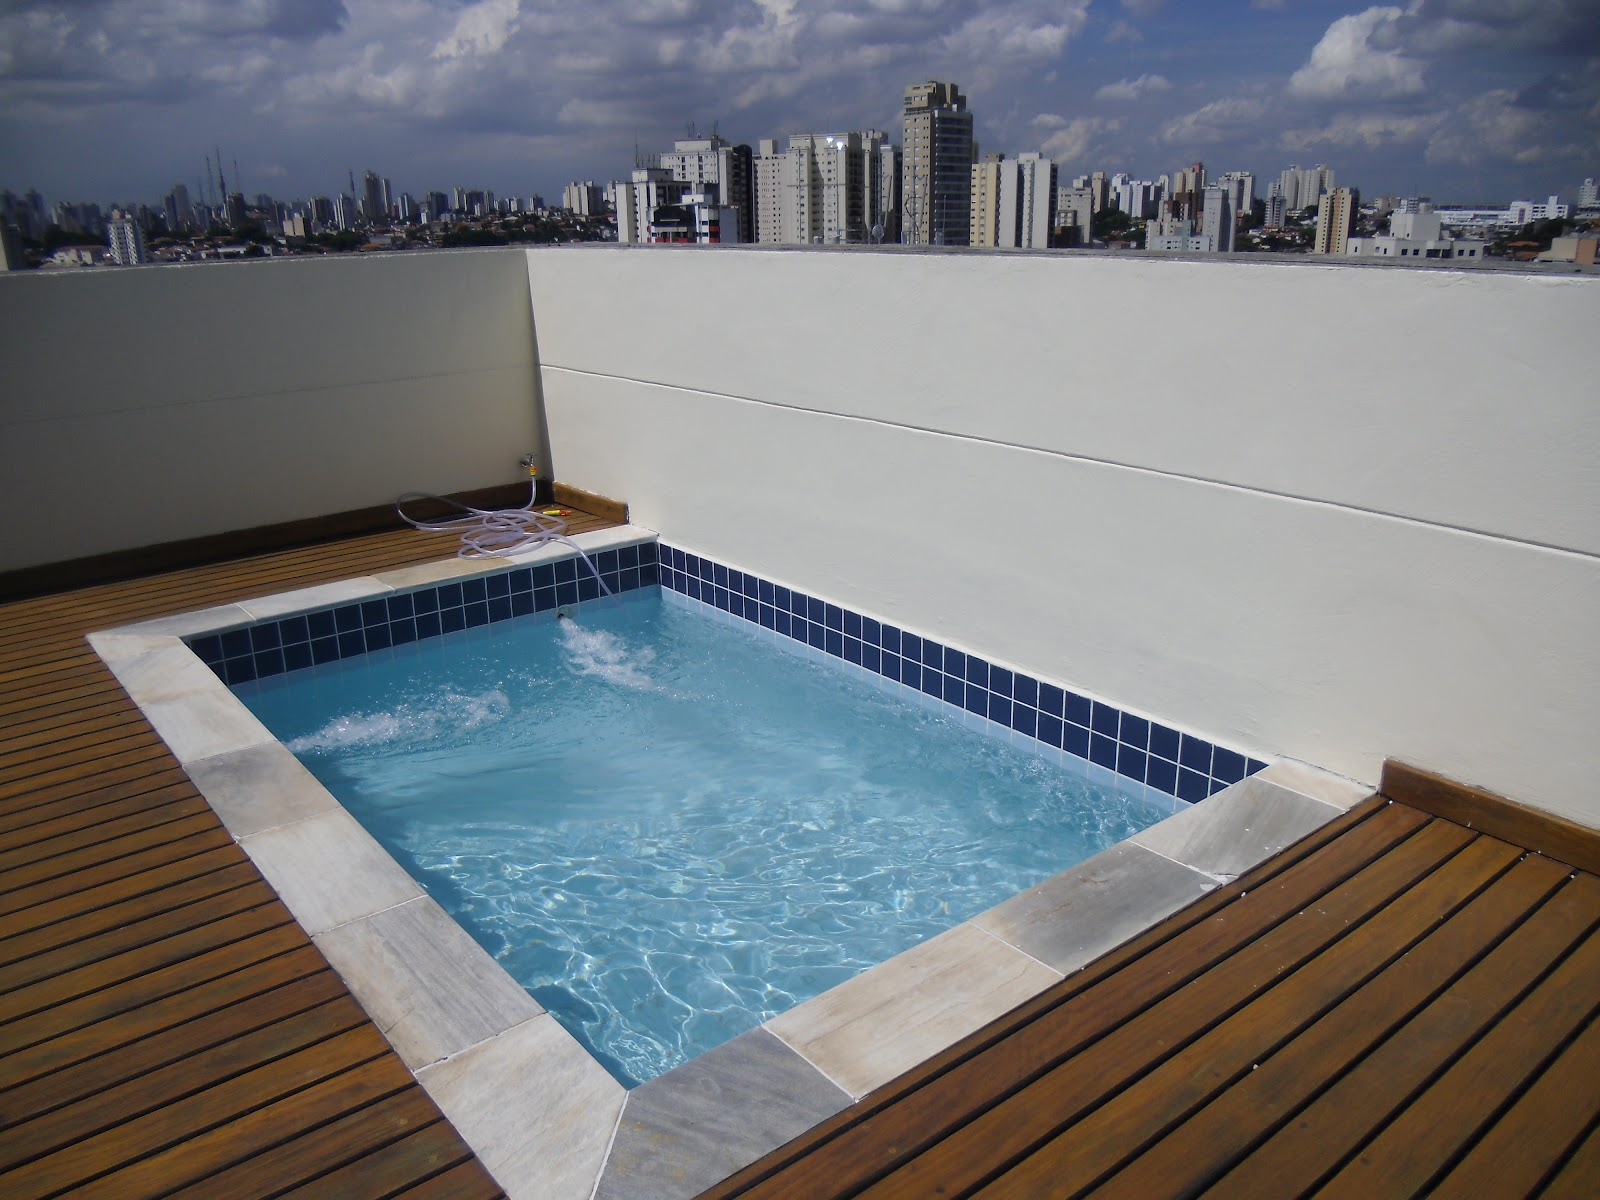 Thonho piscinas piscina residencial for Piscina residencial